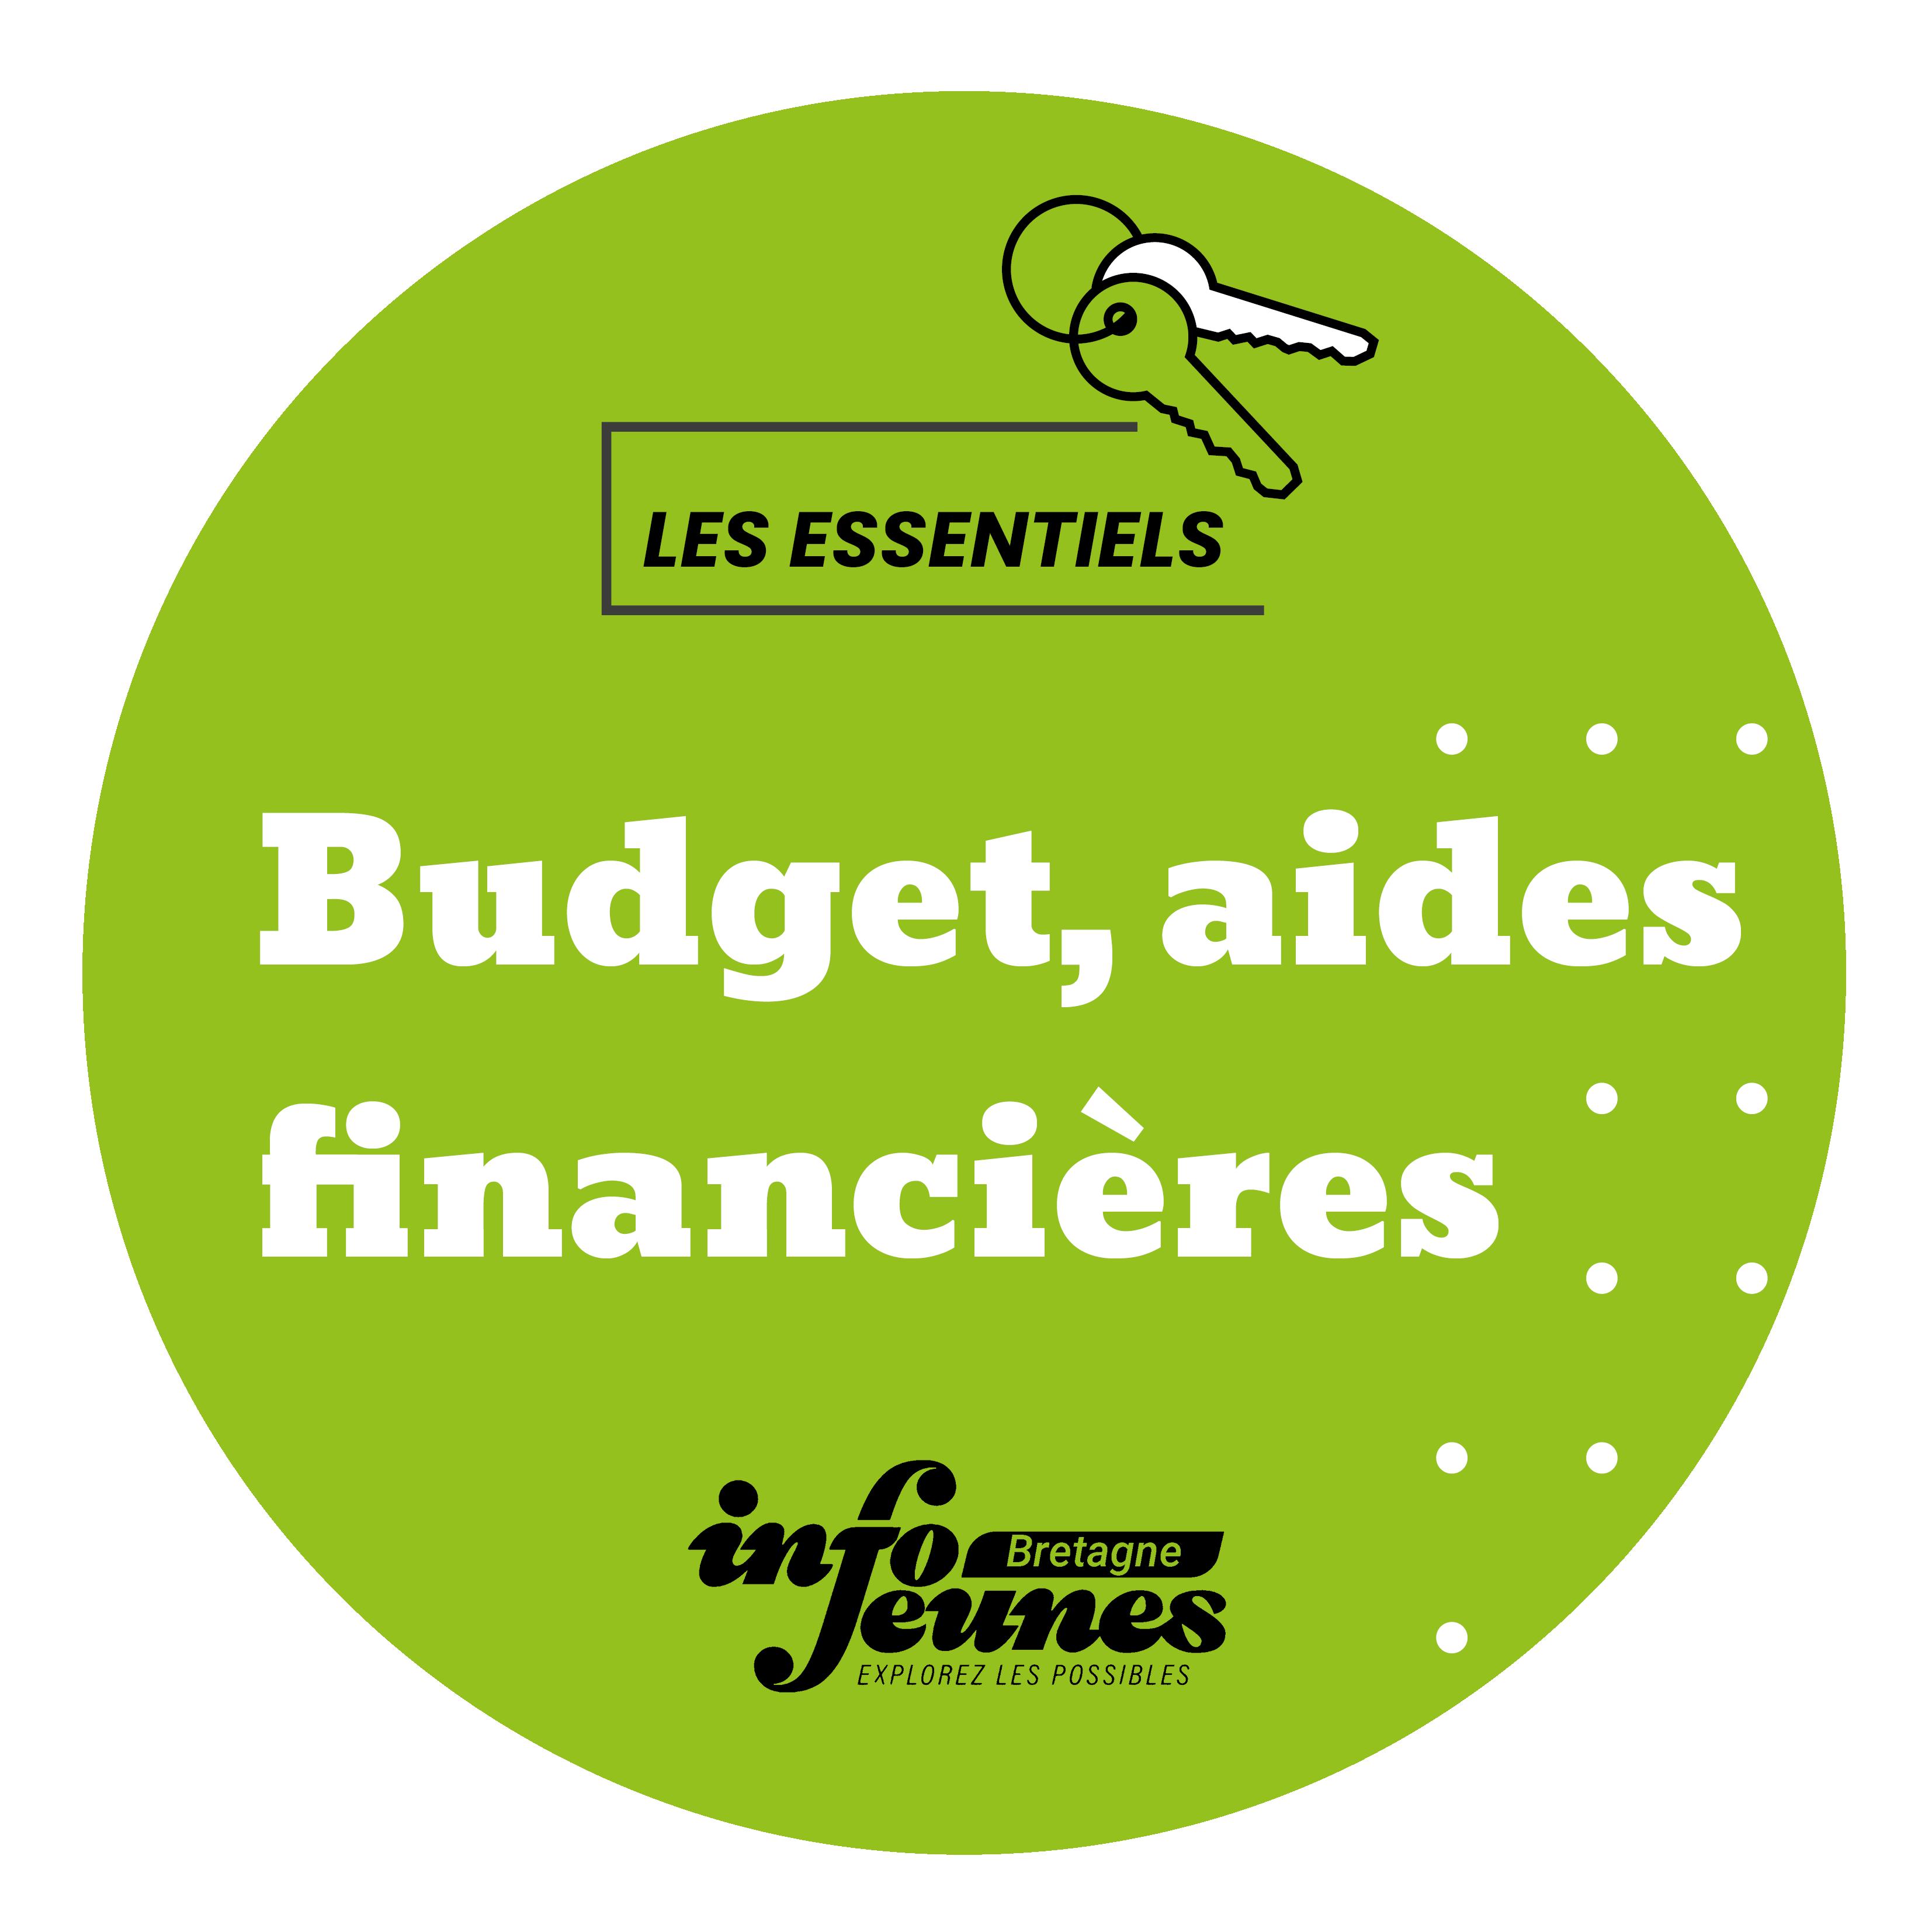 Essentiels_logement_picto_budget